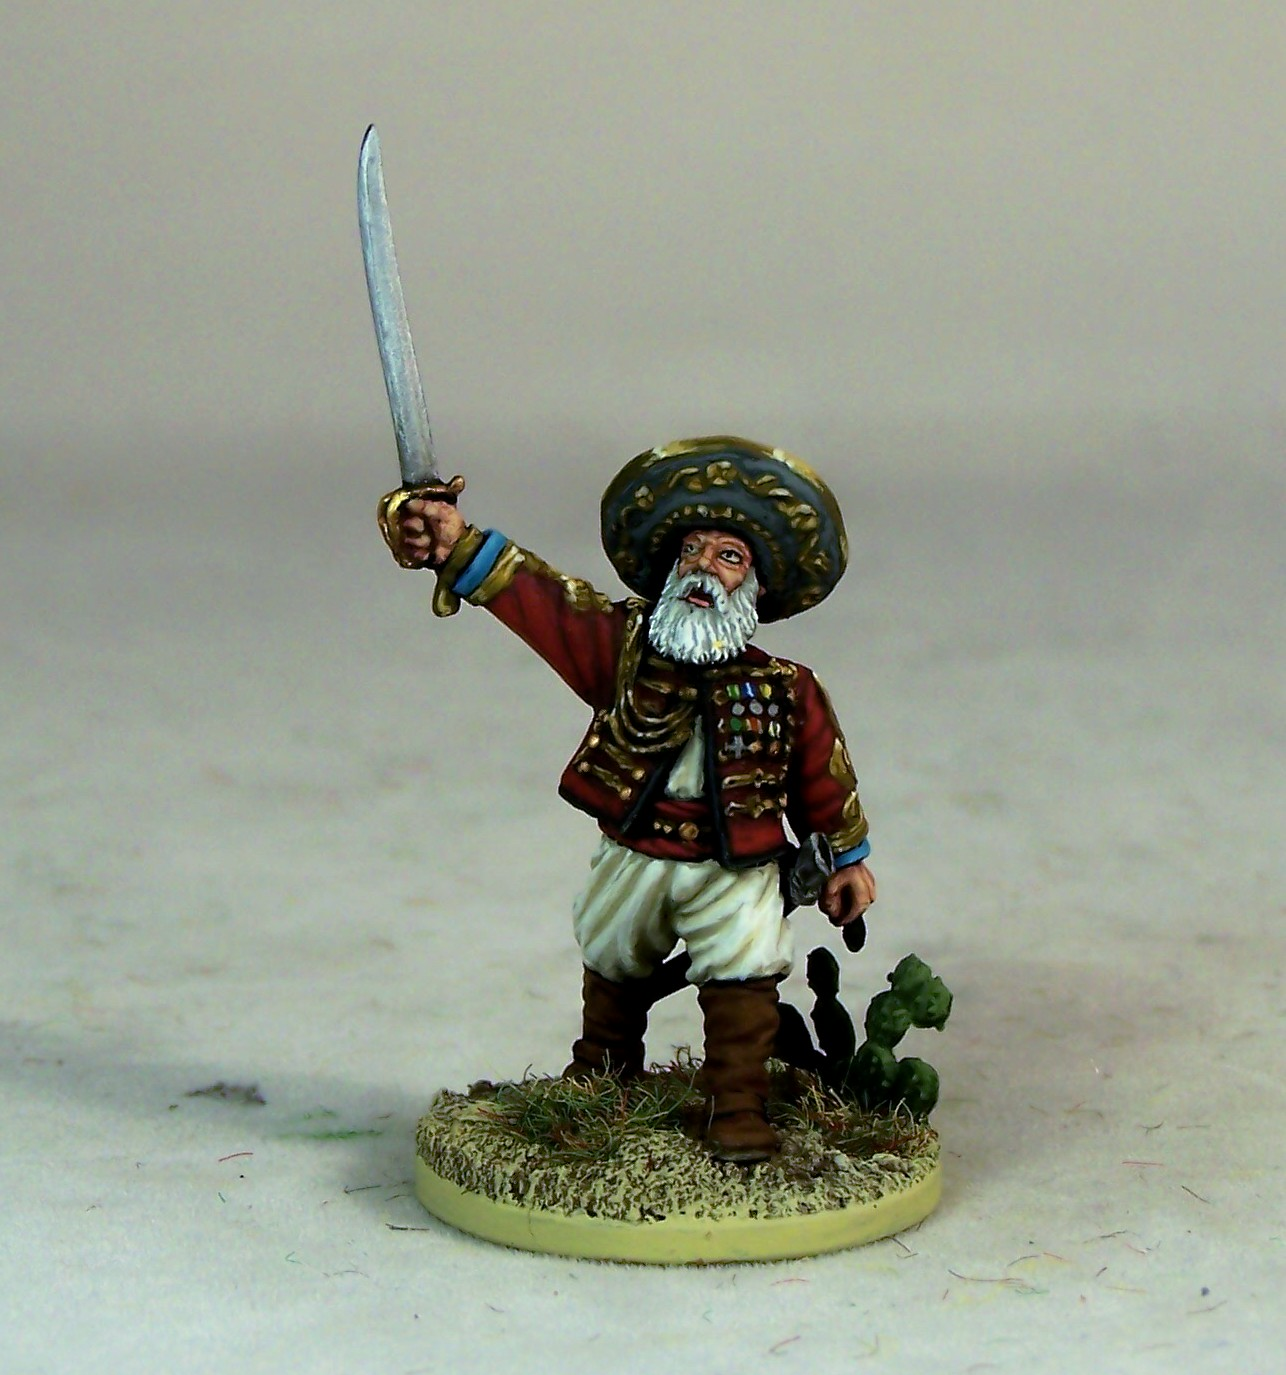 Vitrine de errant49 Colonel+Dupin+28mm+wargaem+miniature+figure